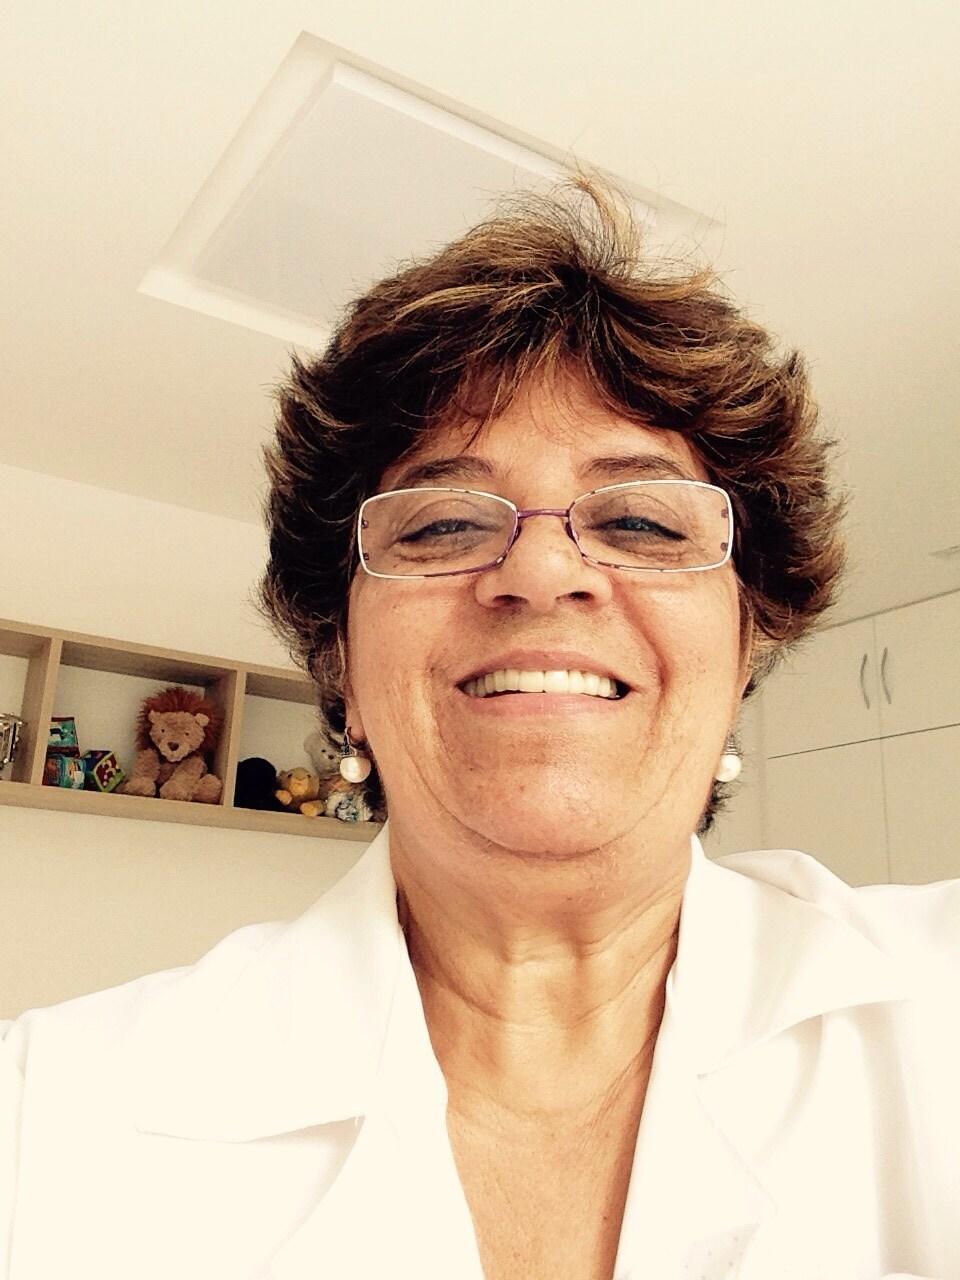 Marilia from Rio de Janeiro